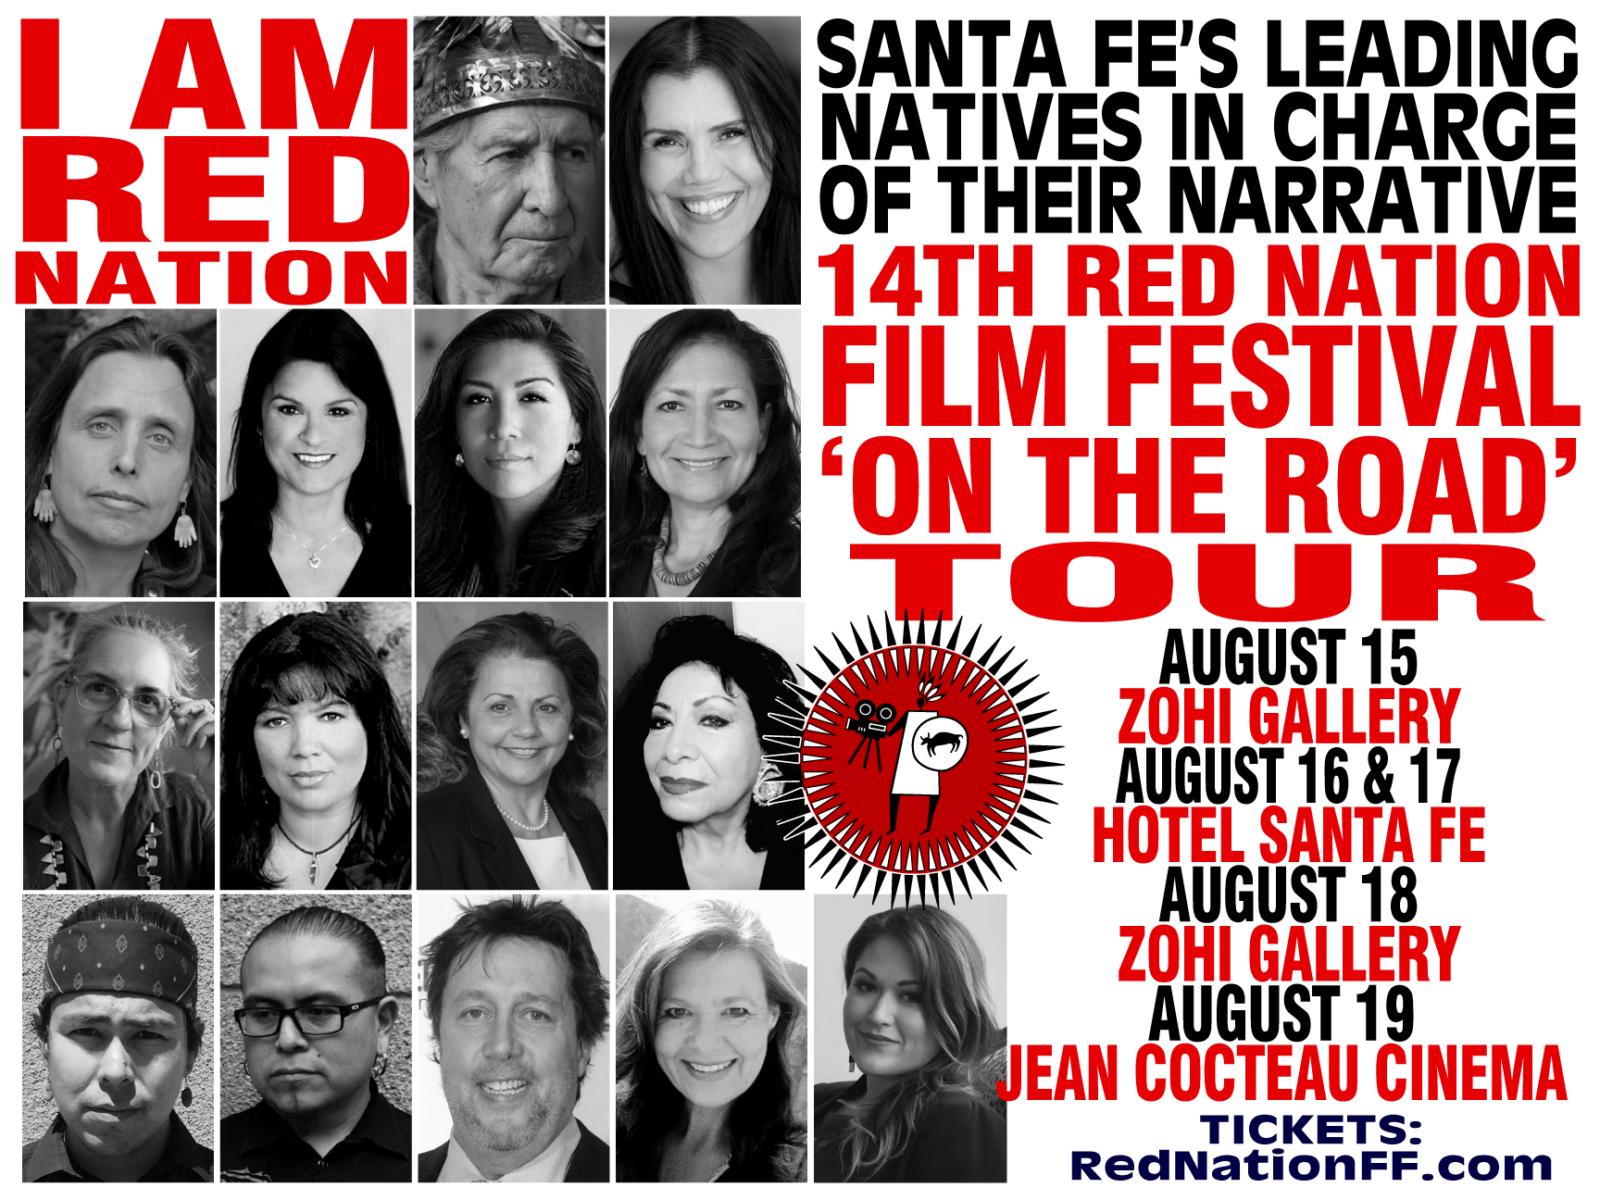 Santa-Fe-2nd-Poster-V6